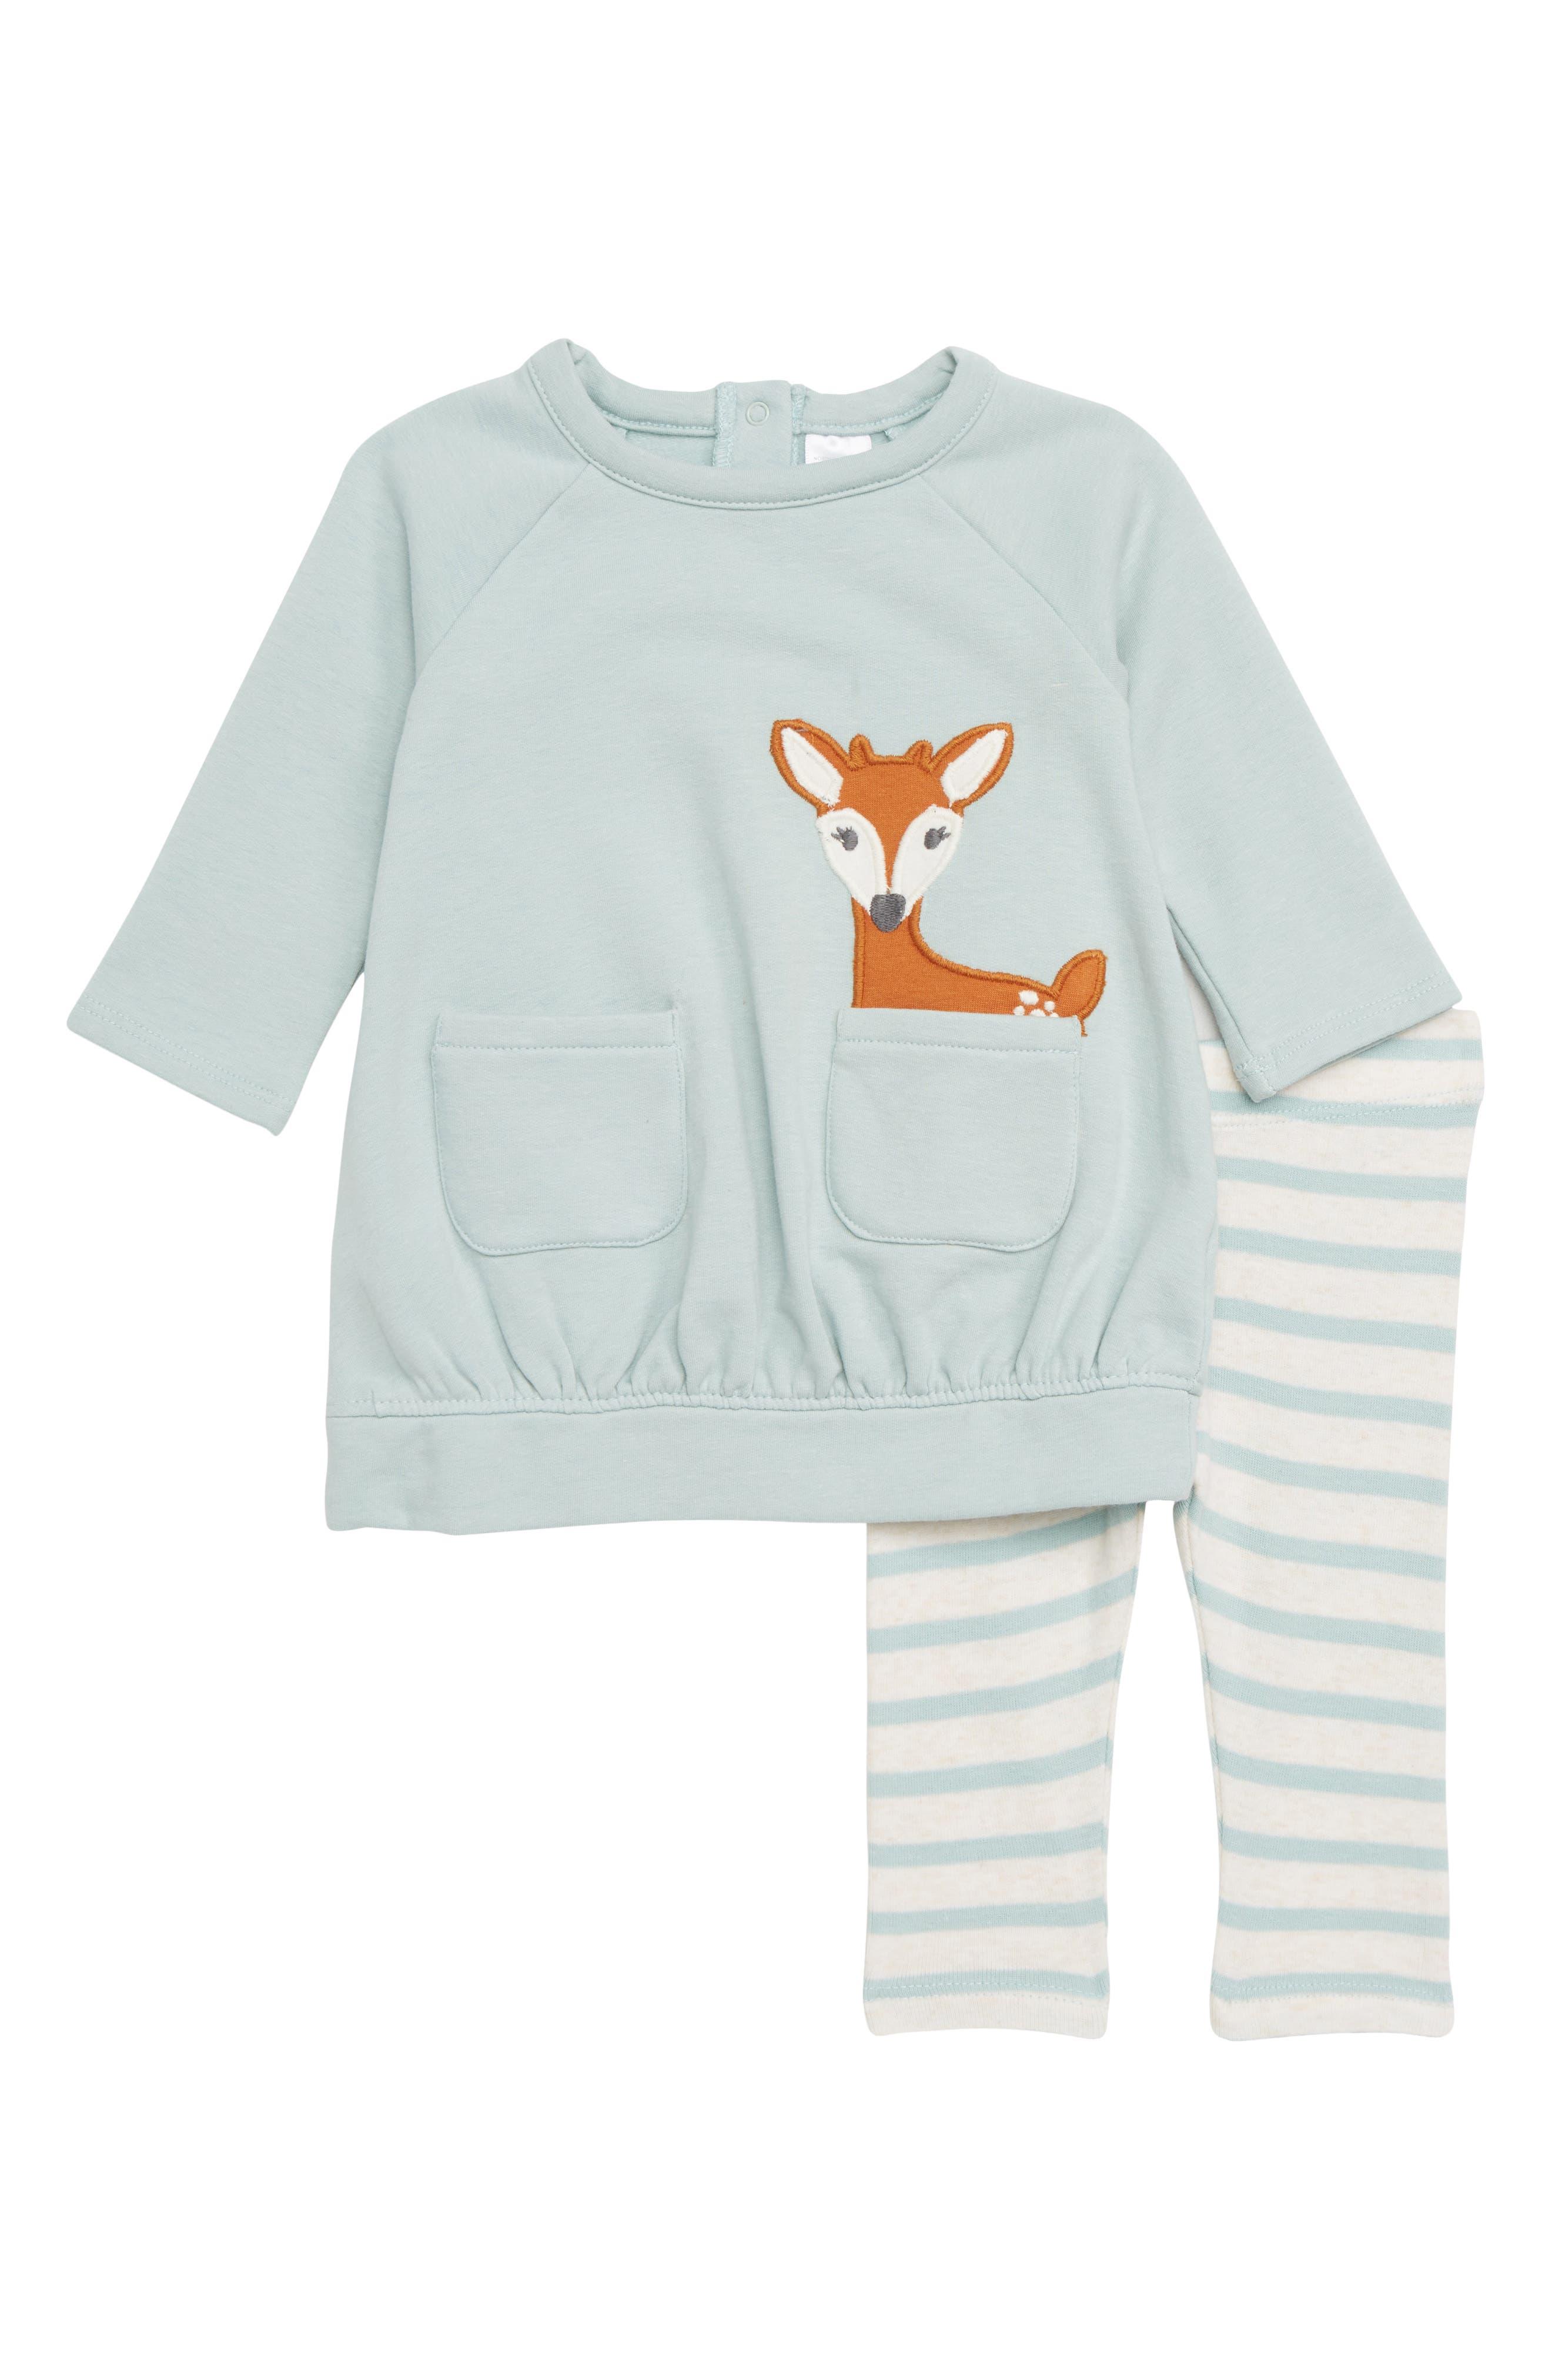 Sweatshirt Dress & Leggings Set,                         Main,                         color, TEAL TIDE FAWN